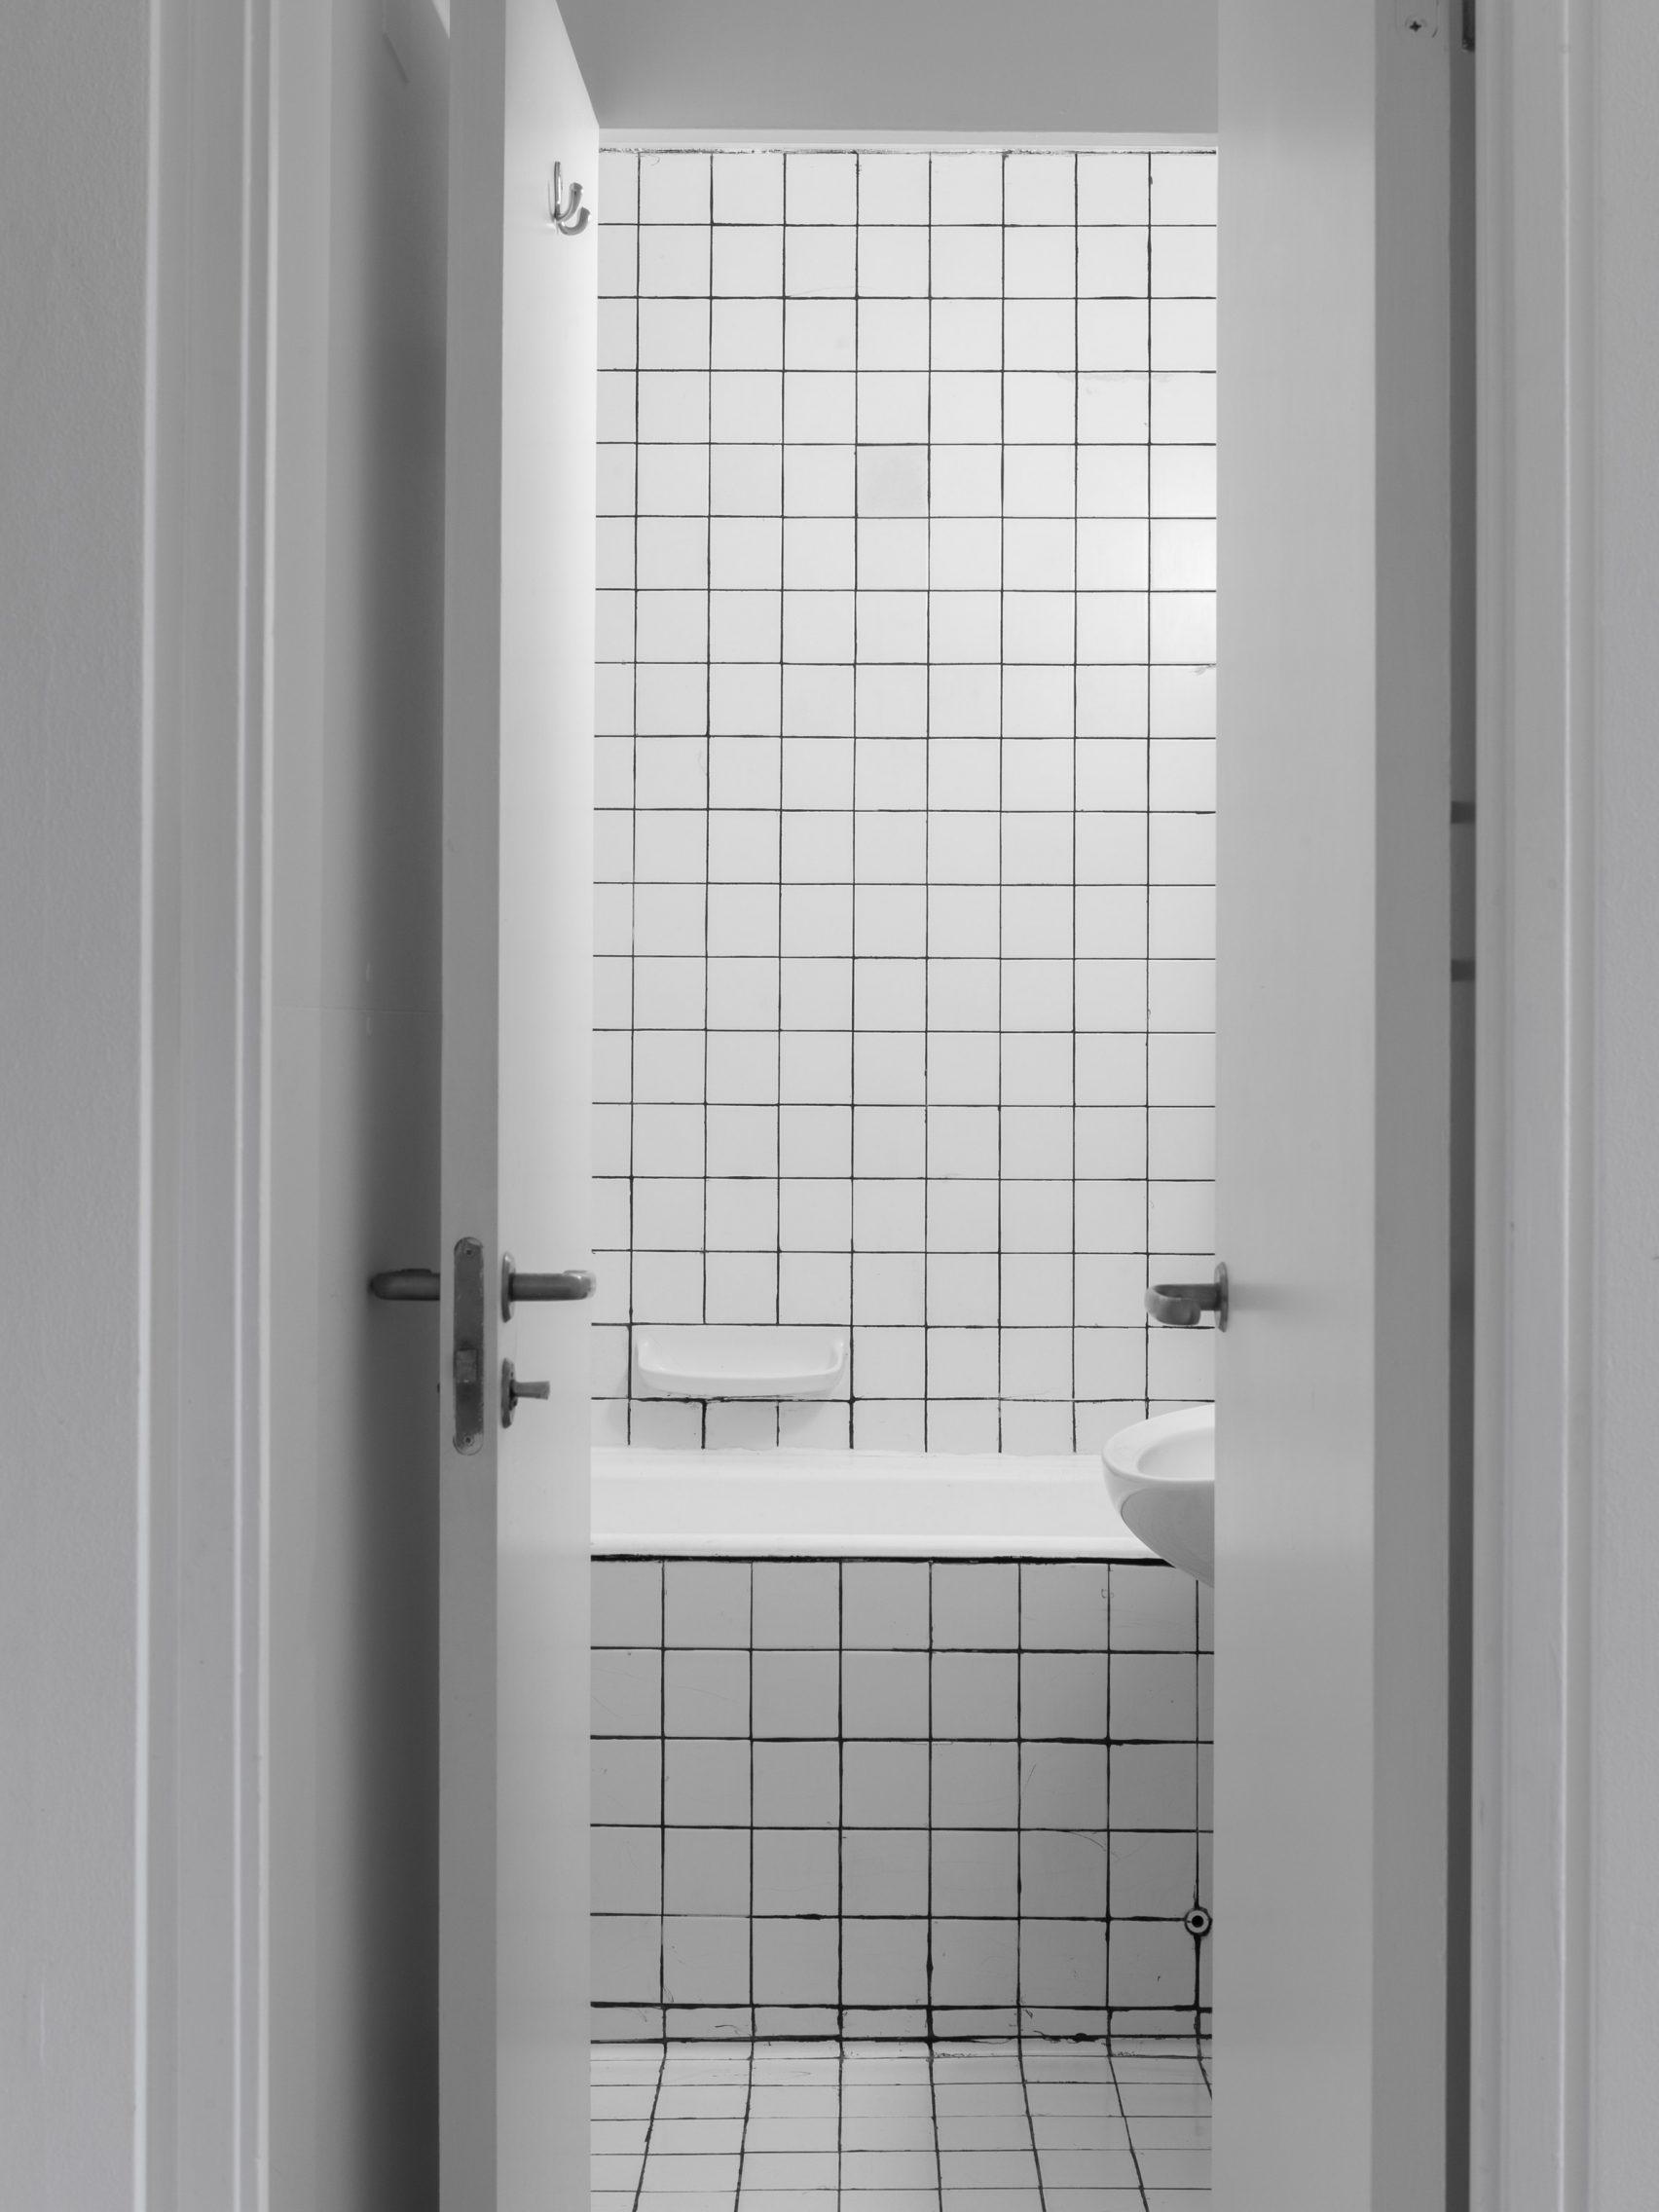 Baño / Handover / Intervention Architecture